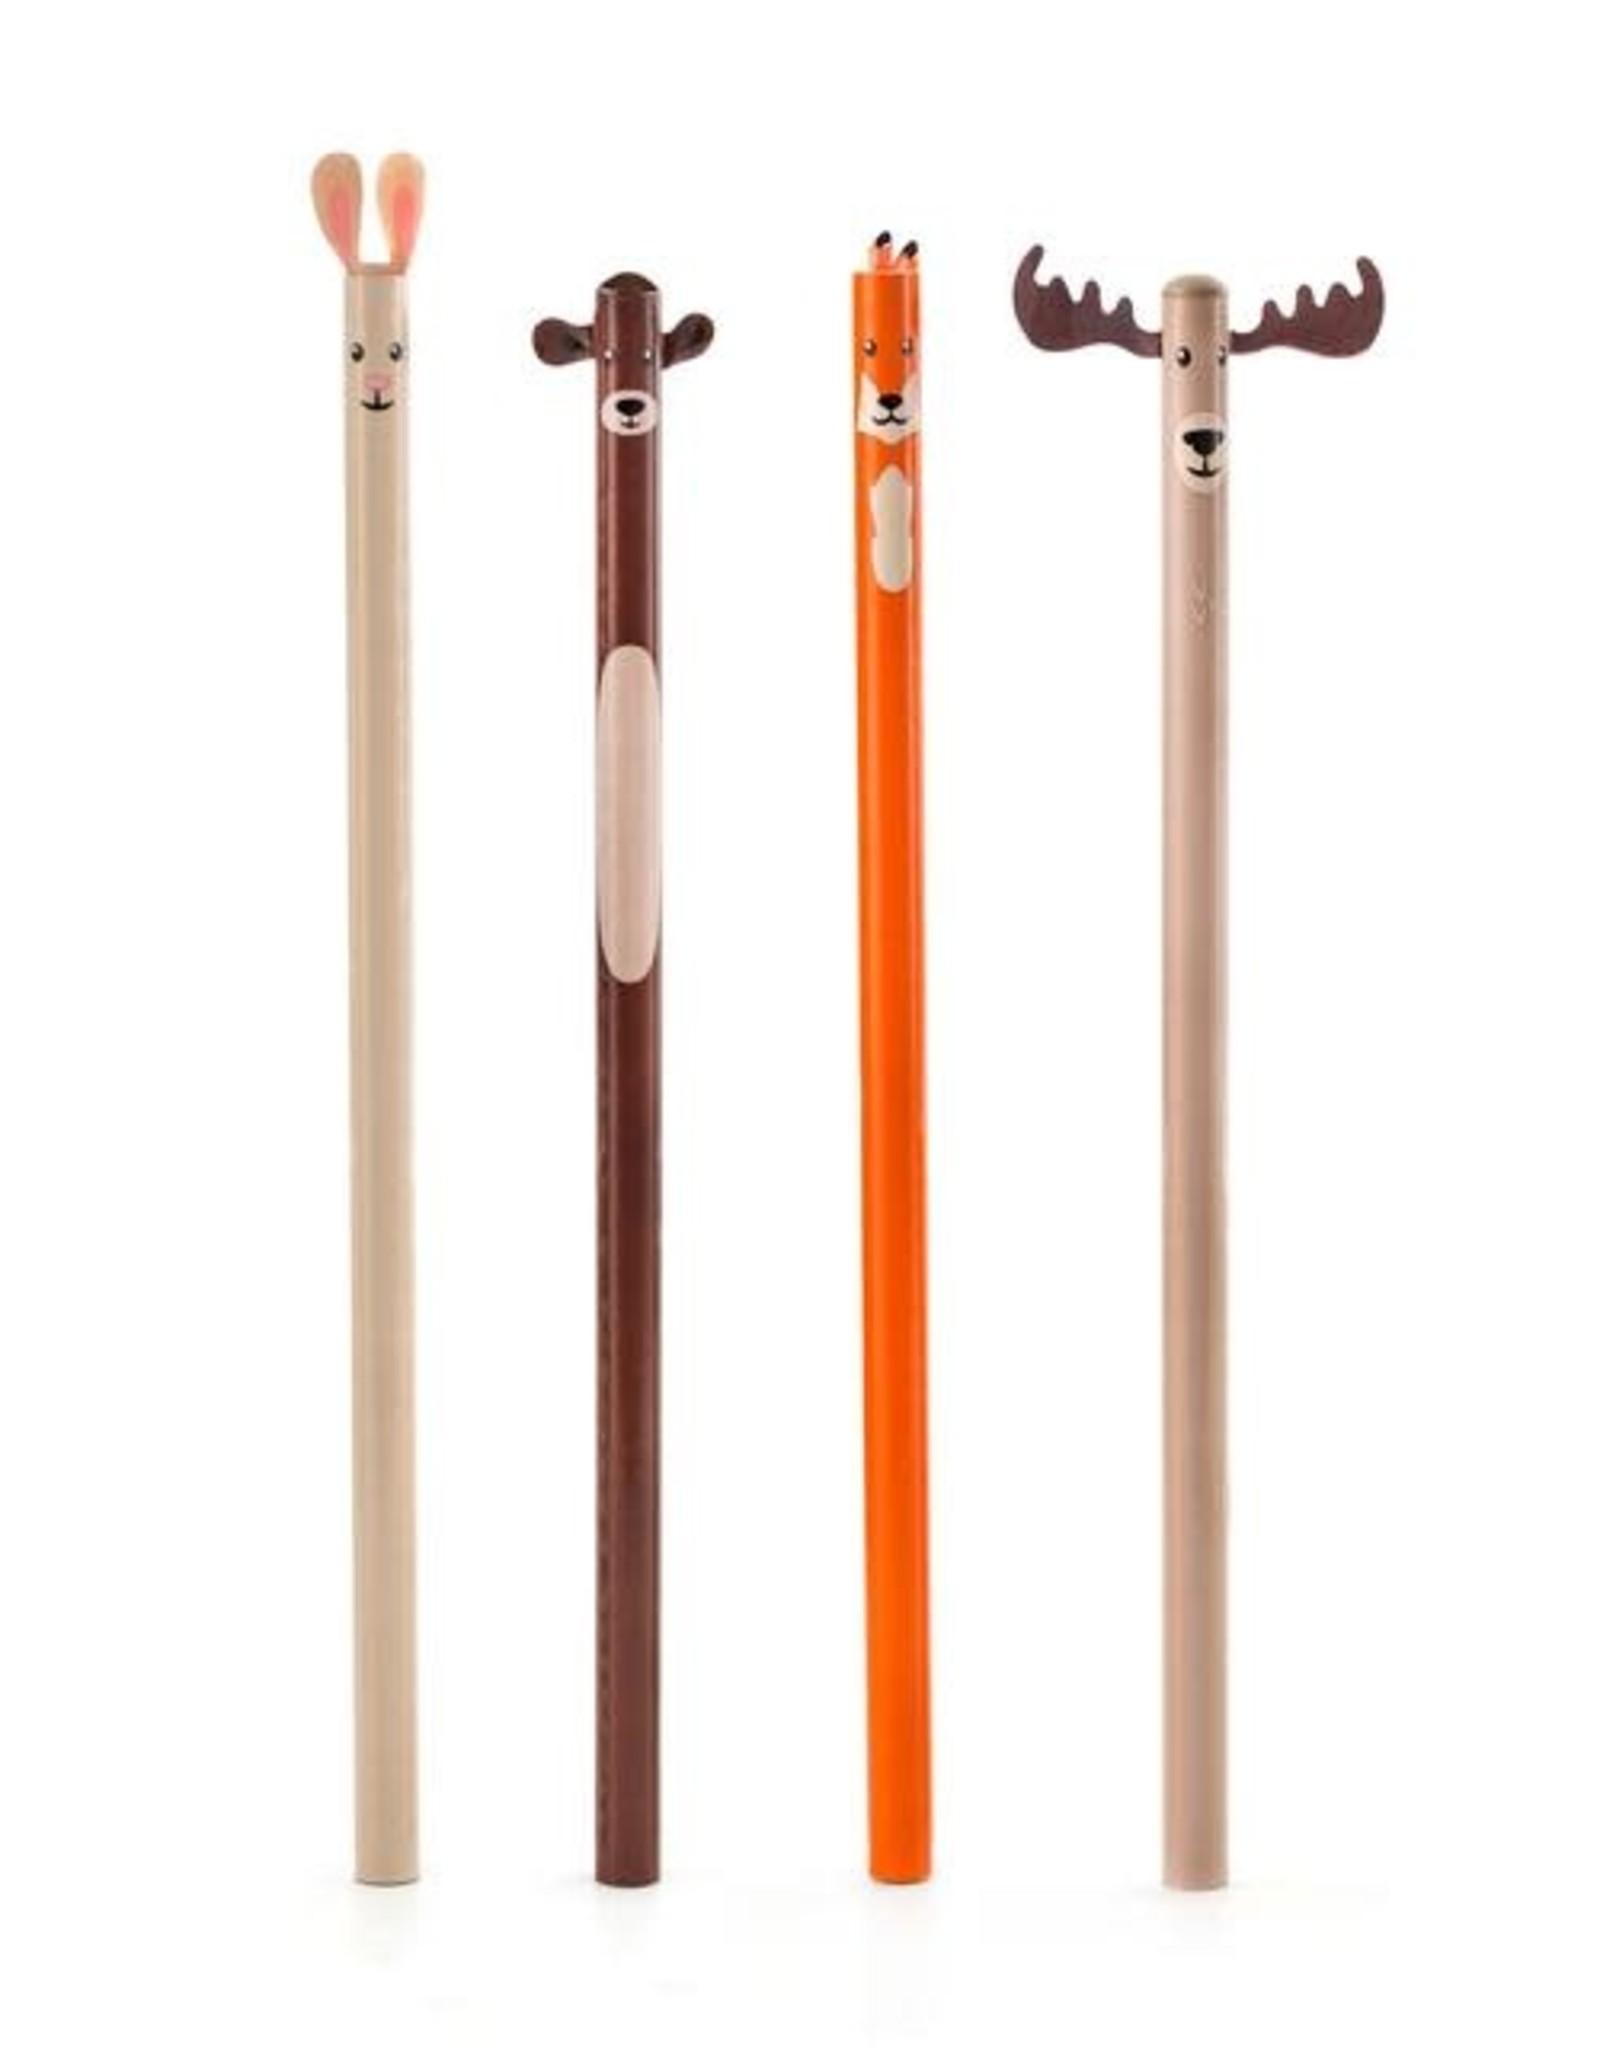 Kikkerland Woodland Pencil Set